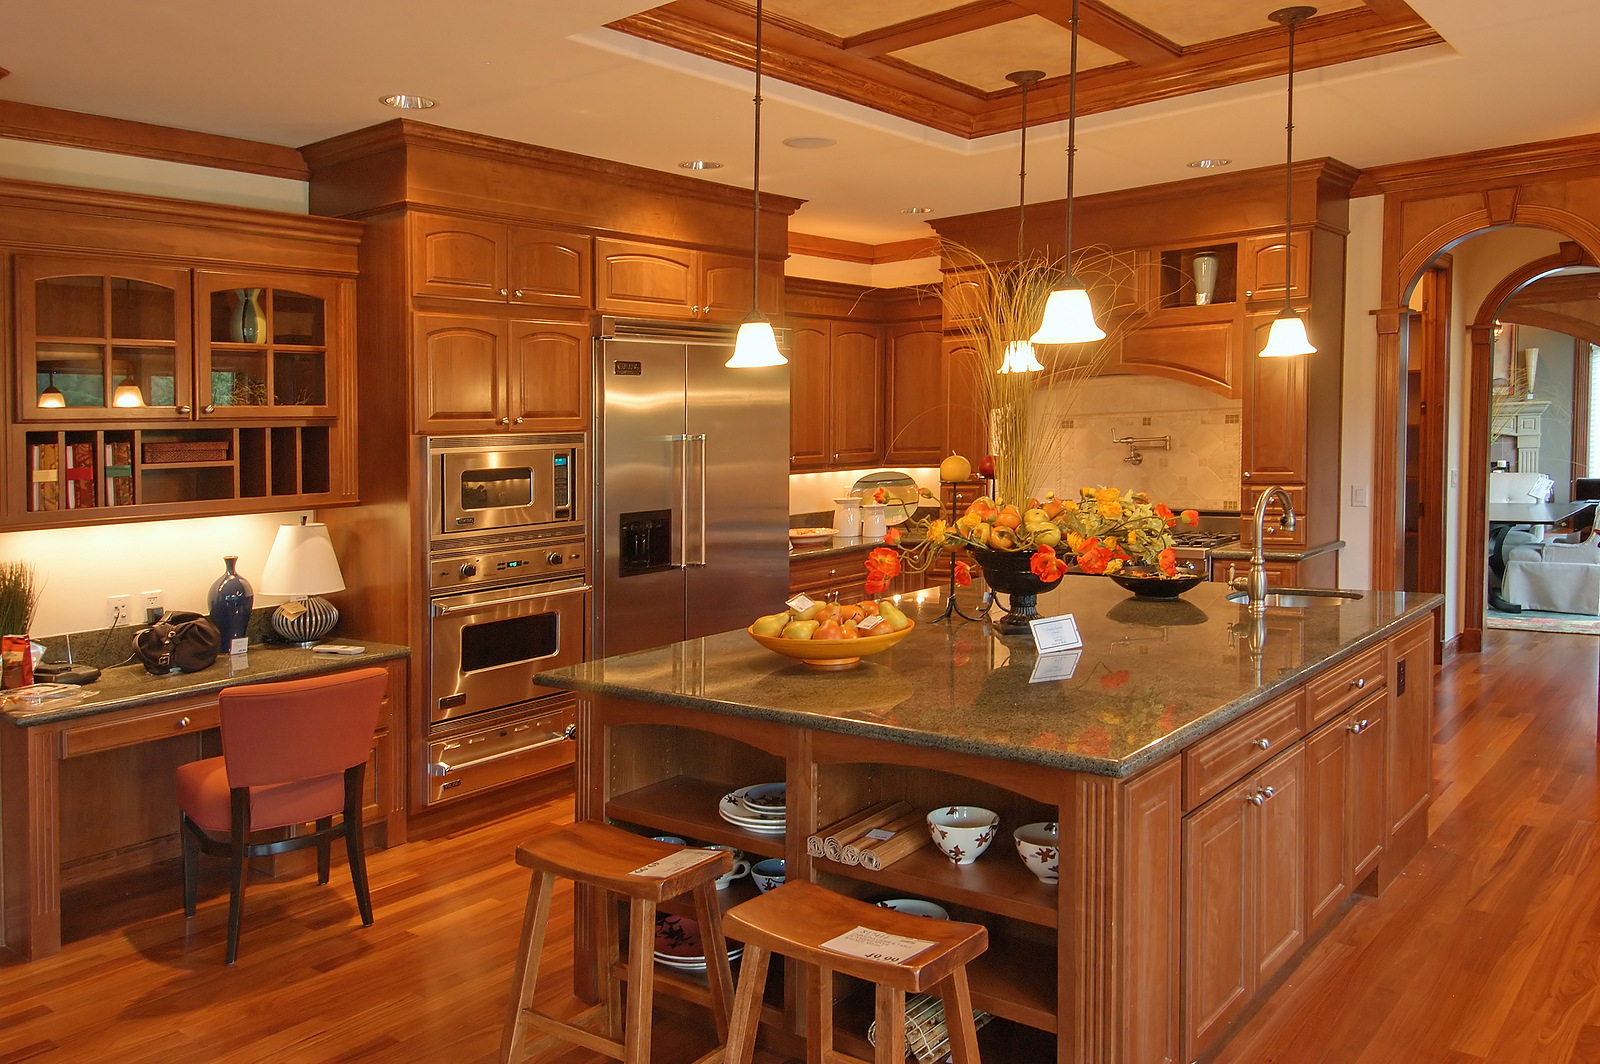 kitchen countertops wooden kitchen countertops Kitchen Countertops